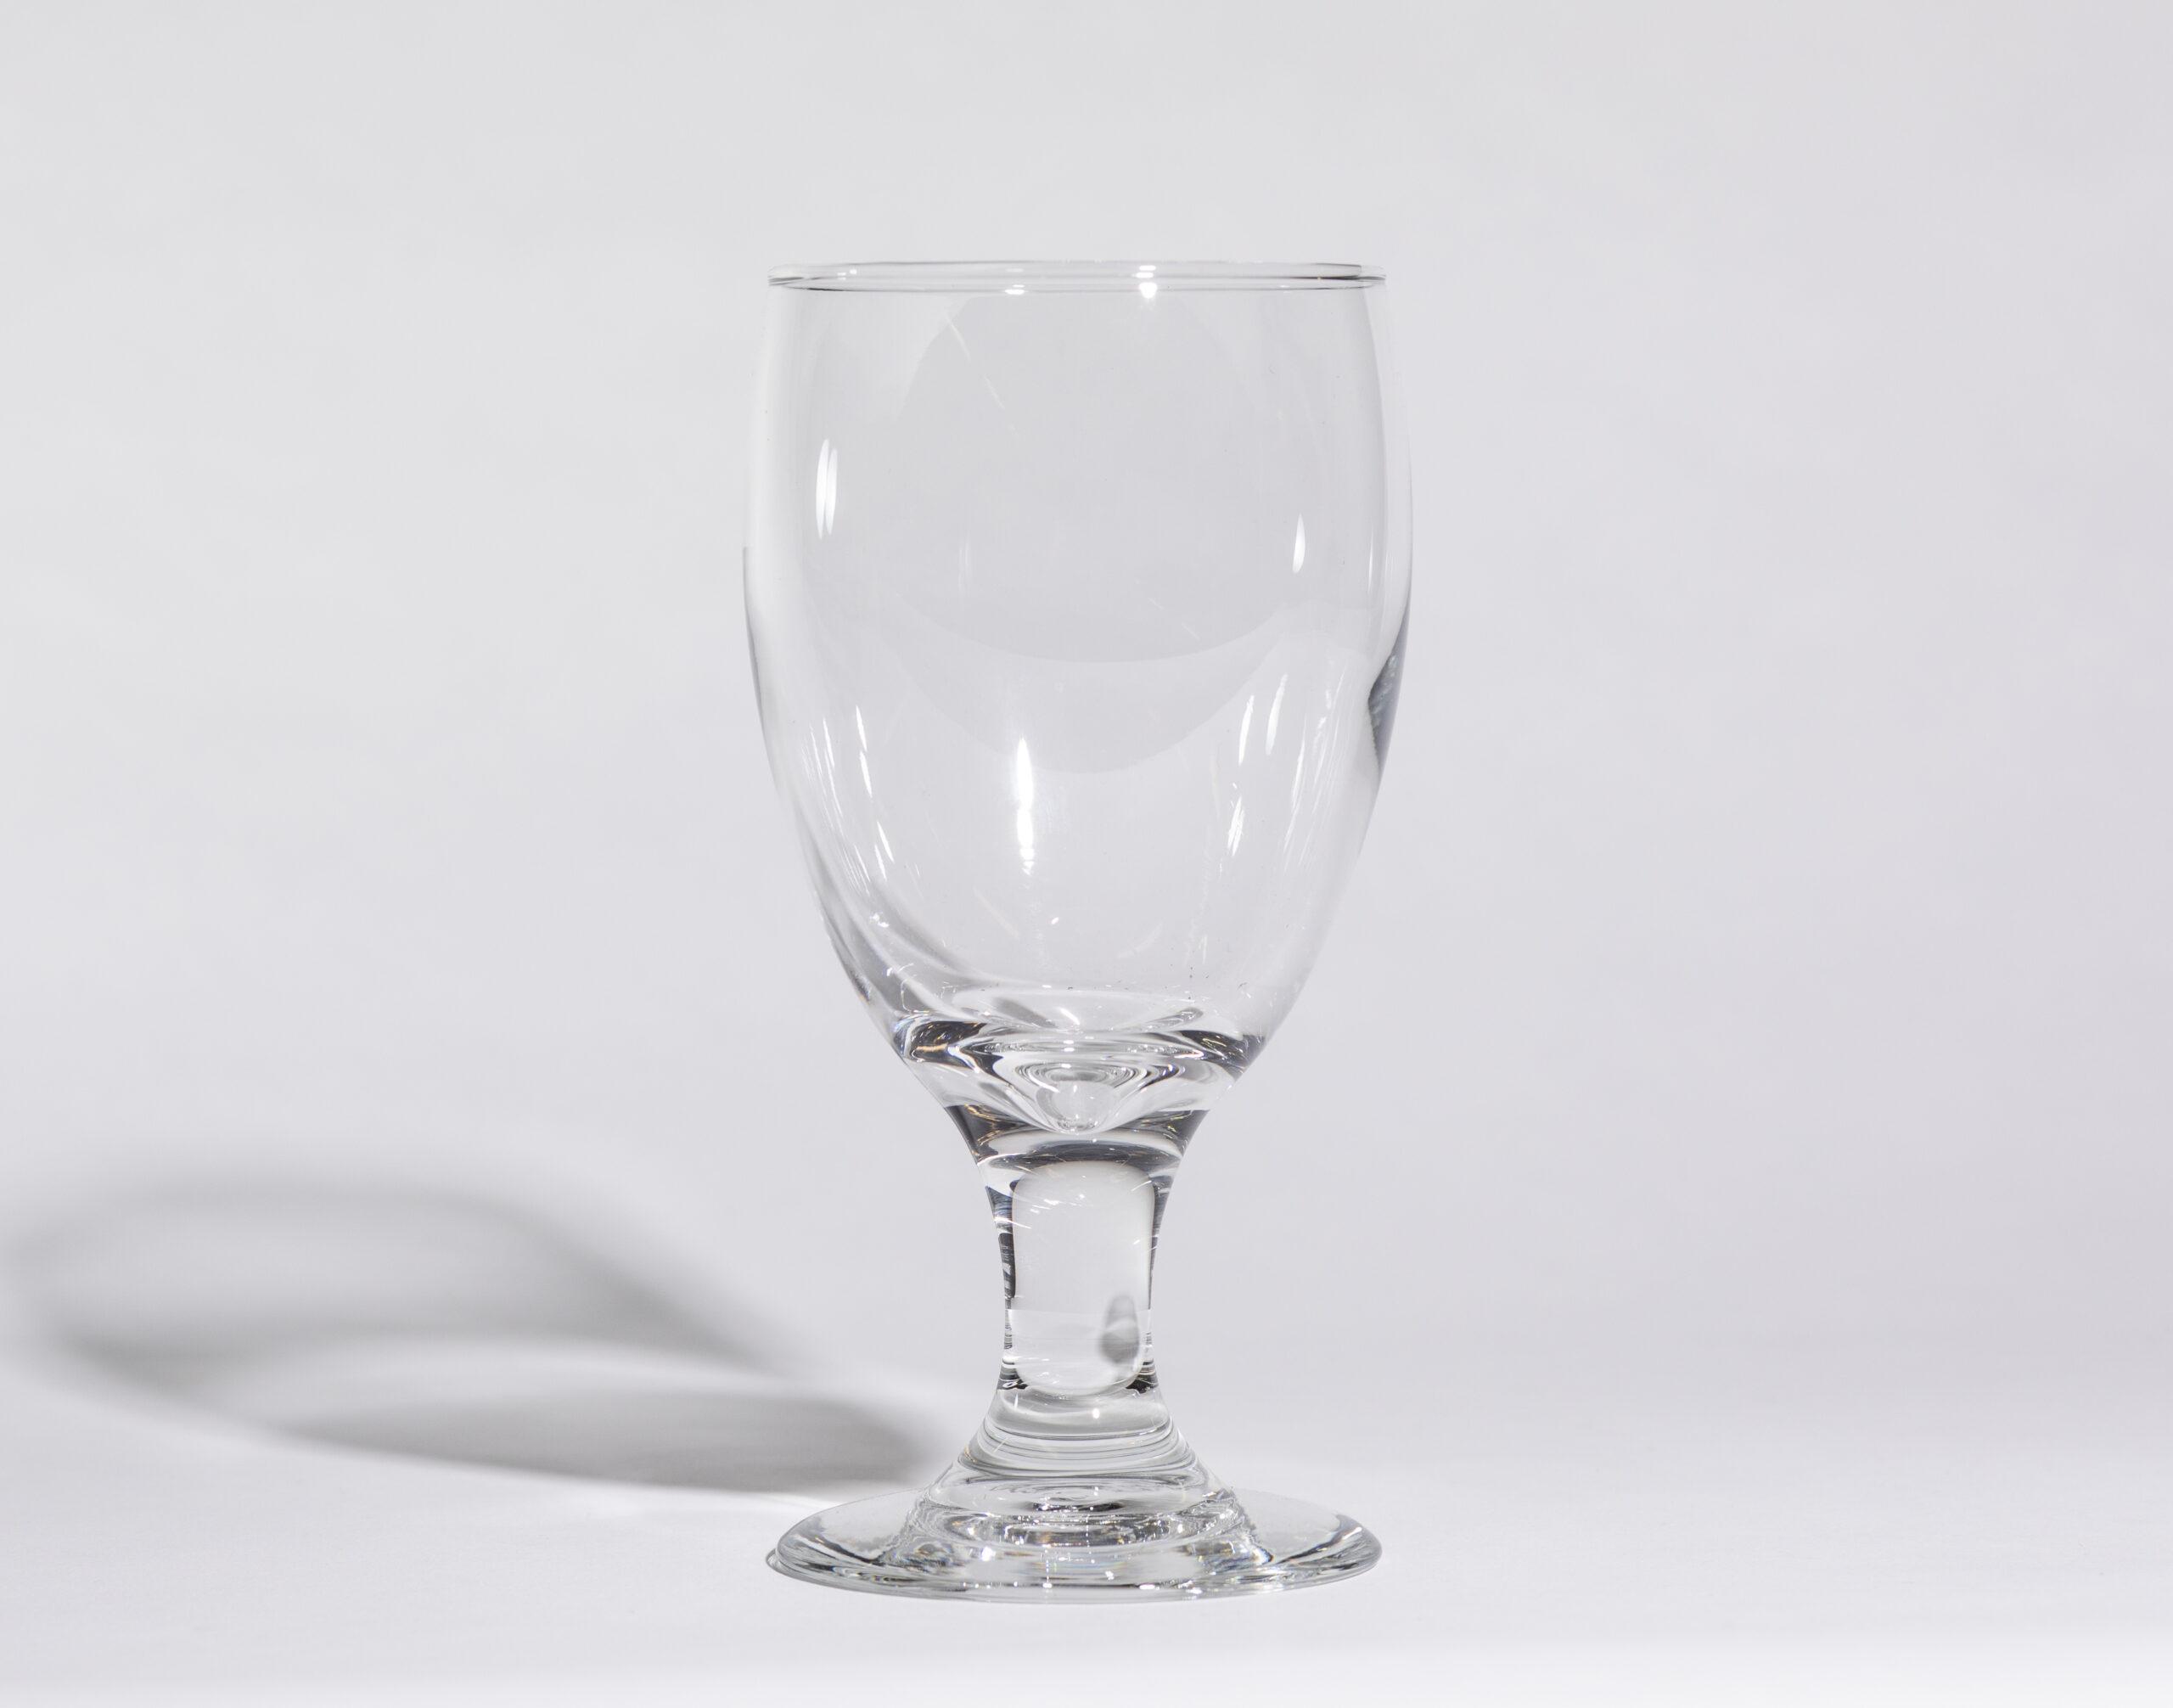 Water glasses (11oz, stemmed)